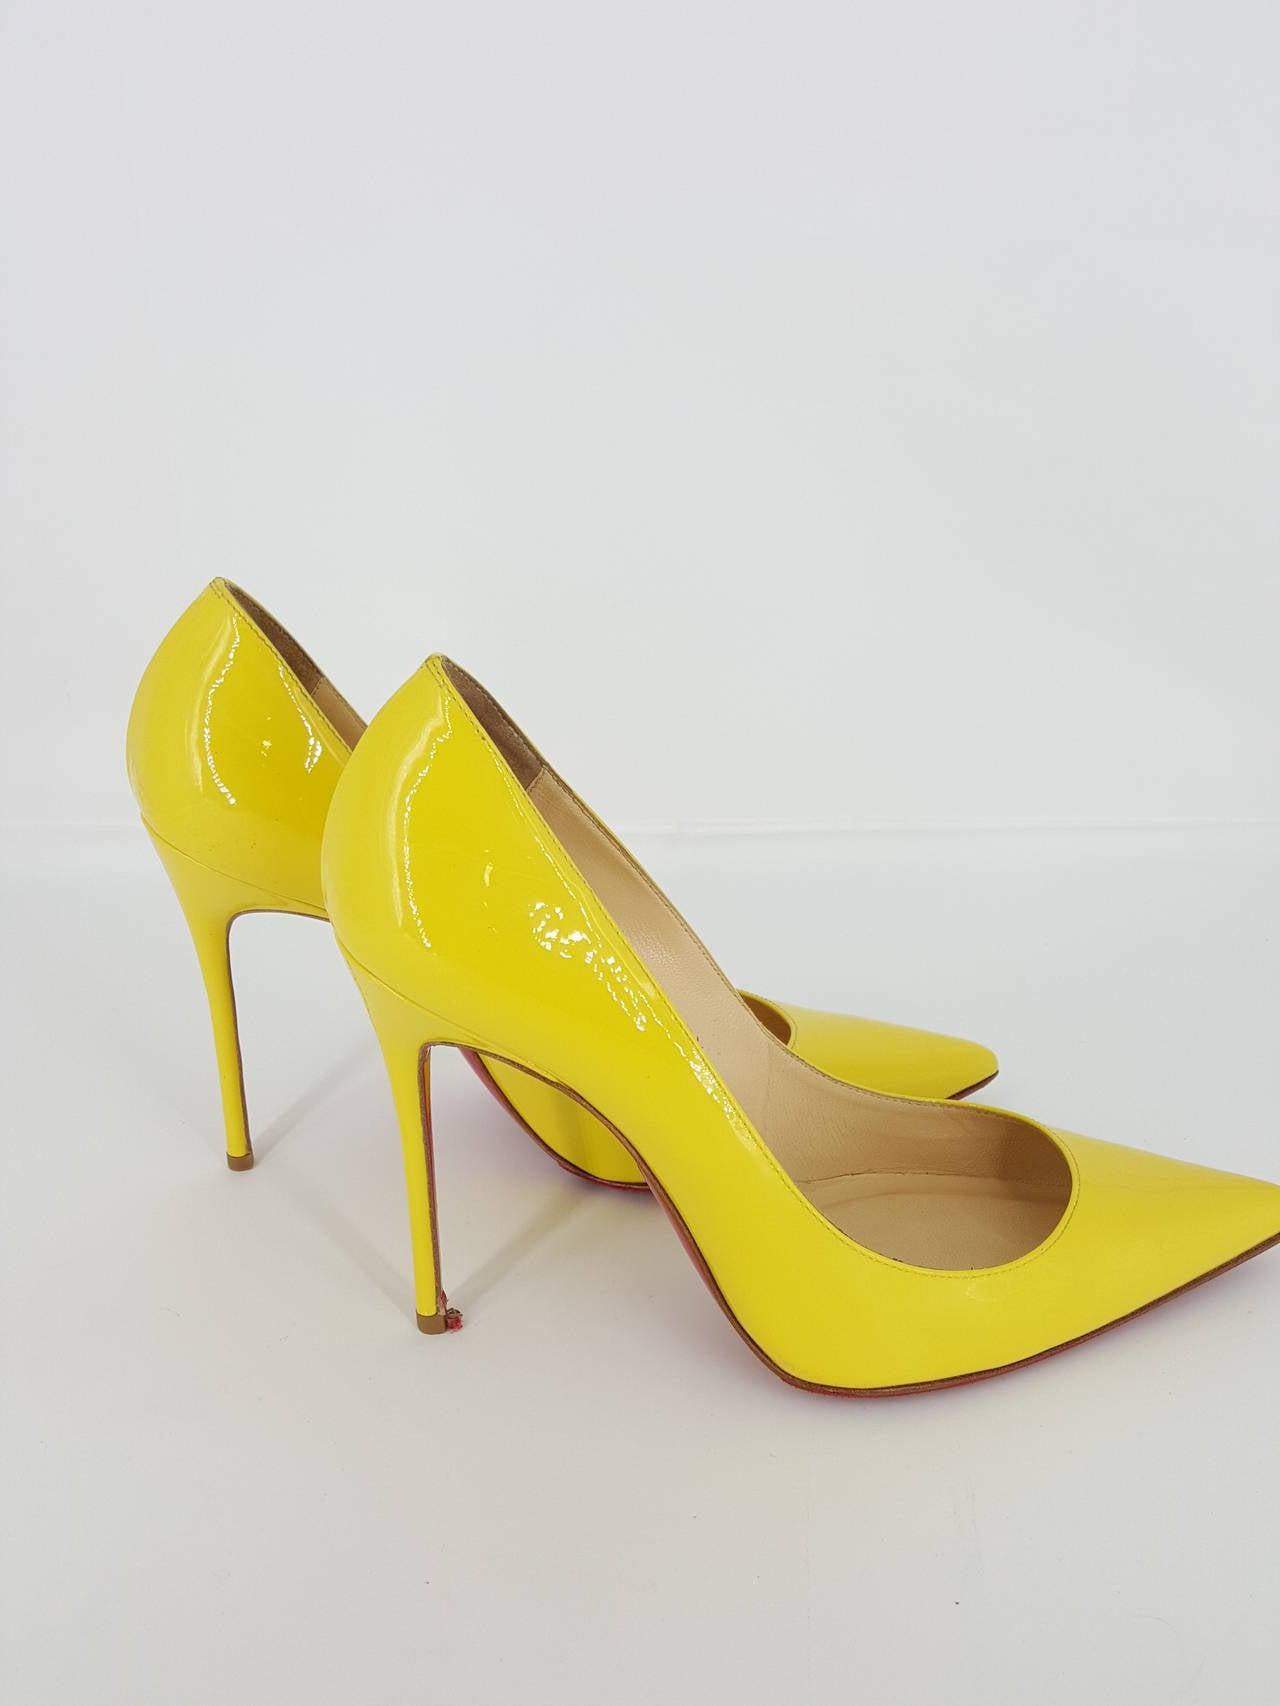 Bright Yellow High Heels